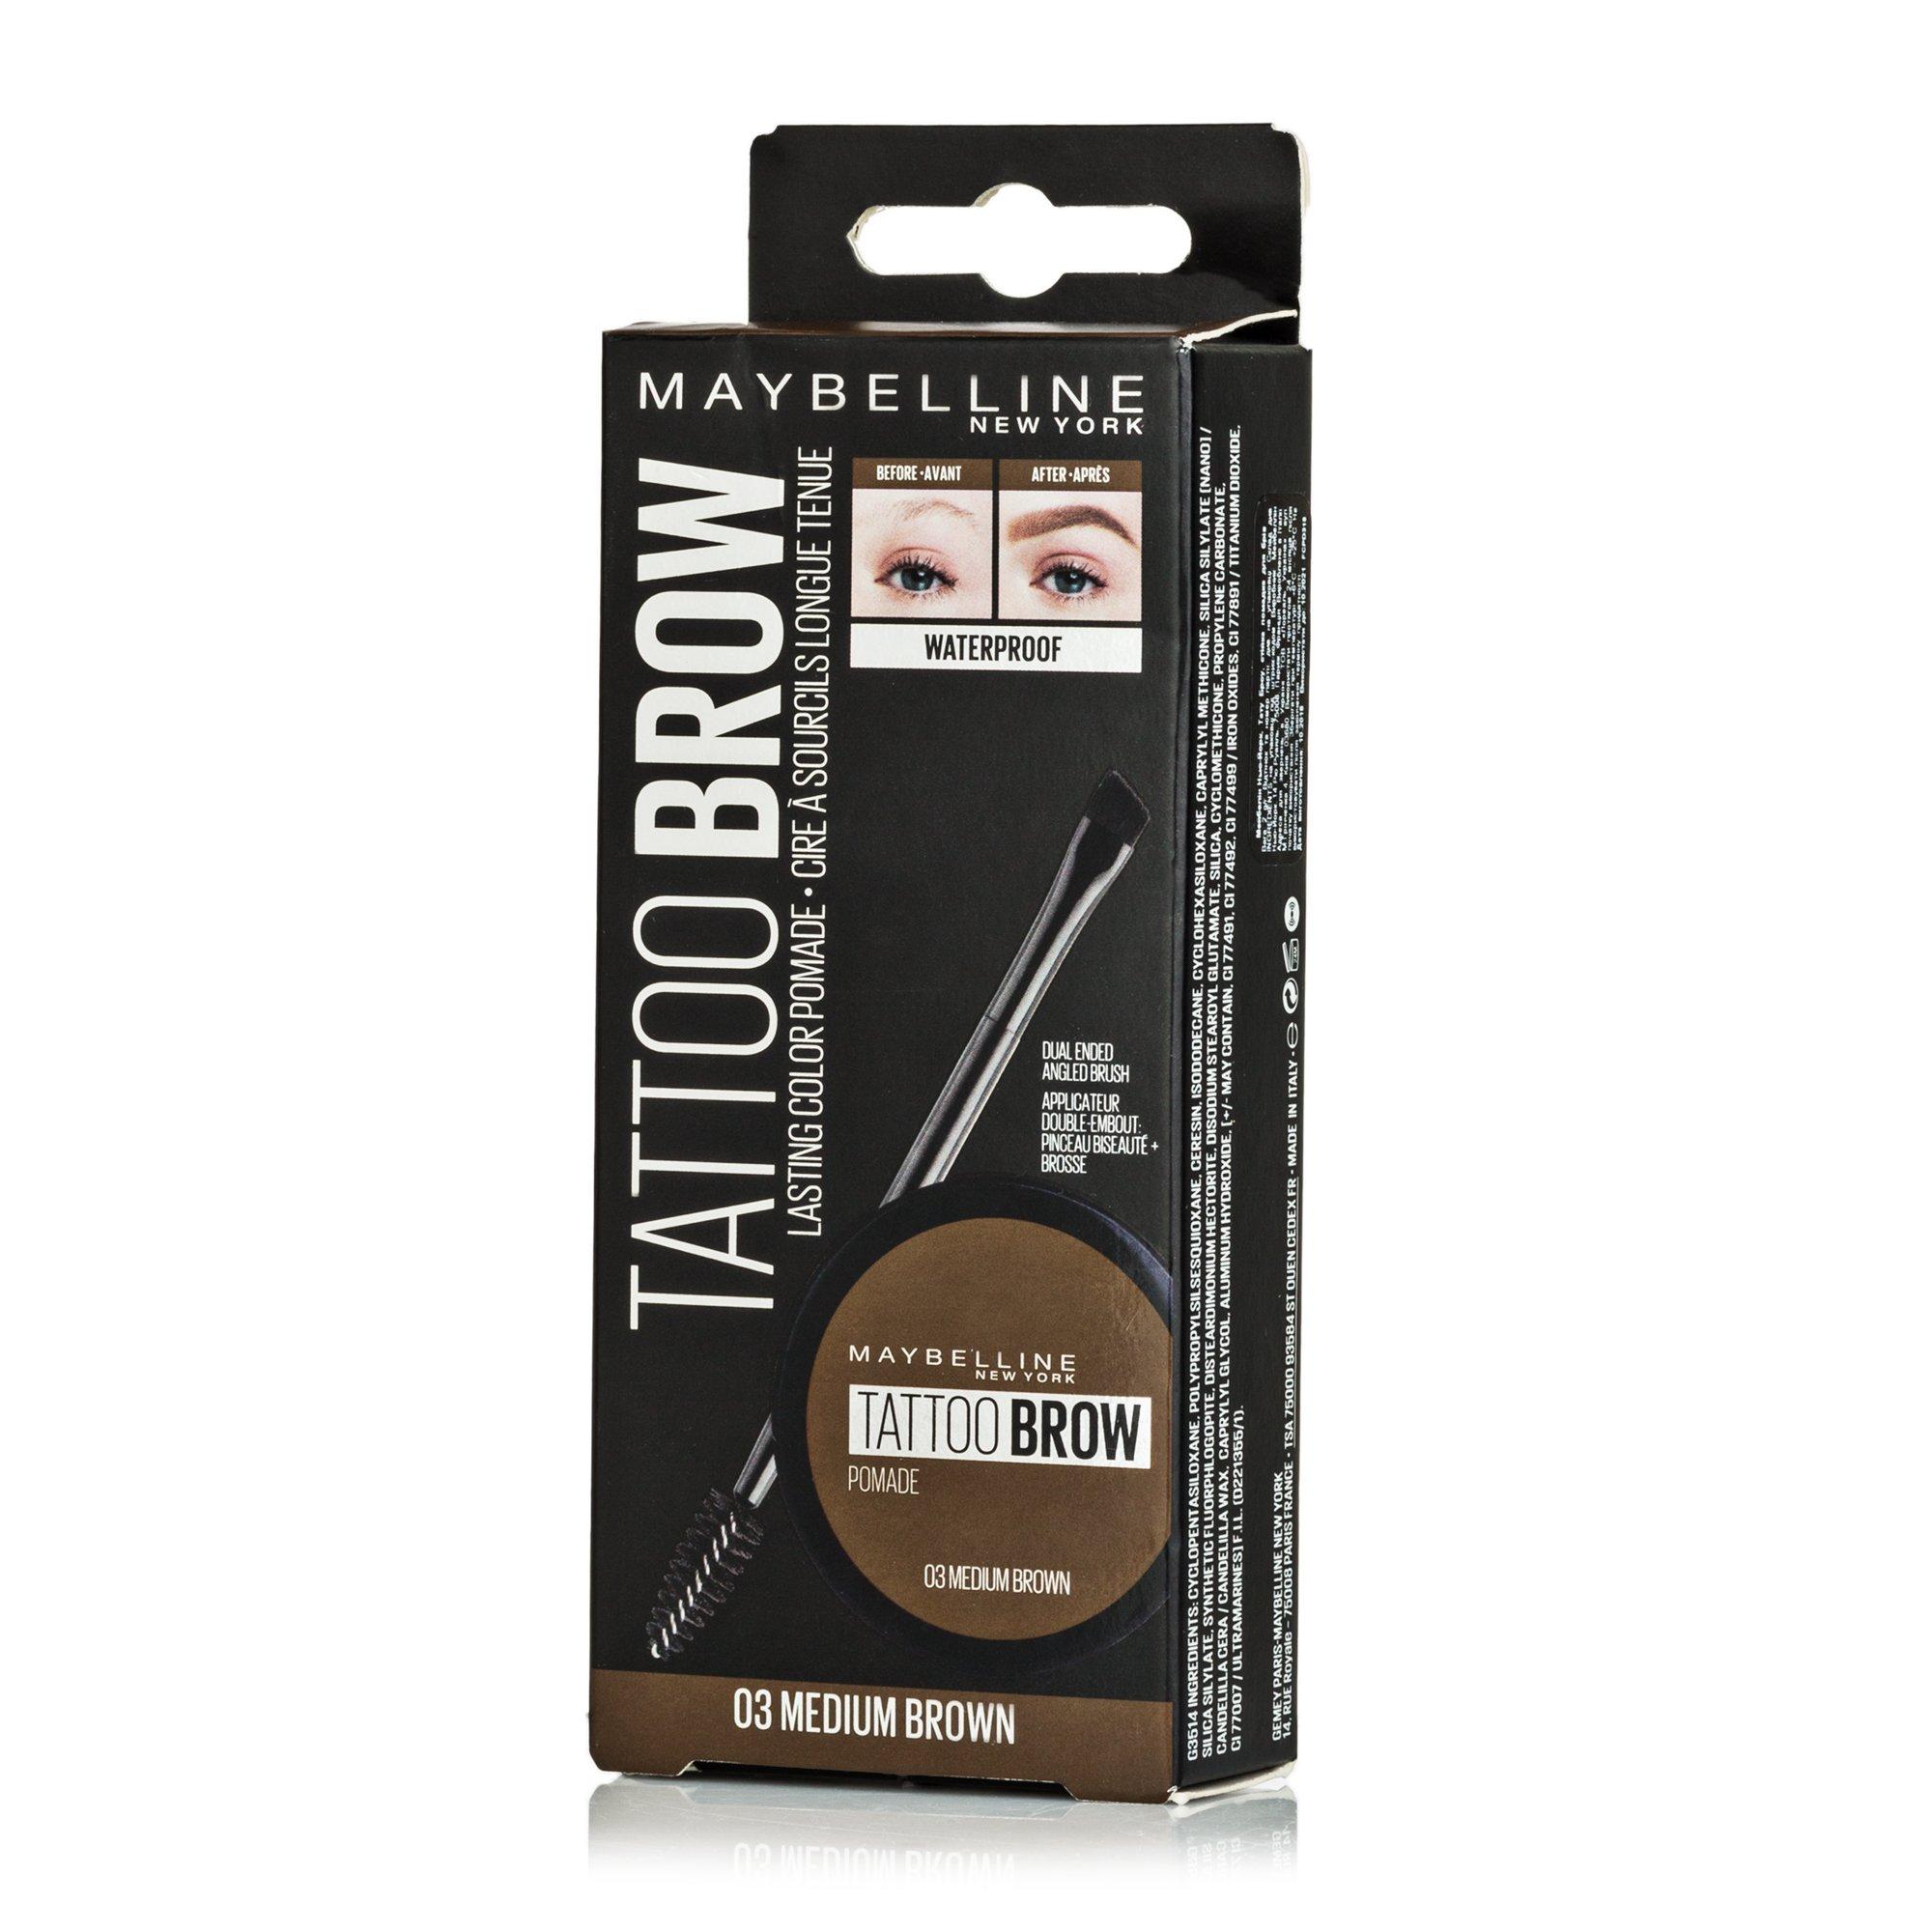 Помада для бровей Maybelline Нью-Йорк Tatto Brow, Maybelline New York  - купить со скидкой